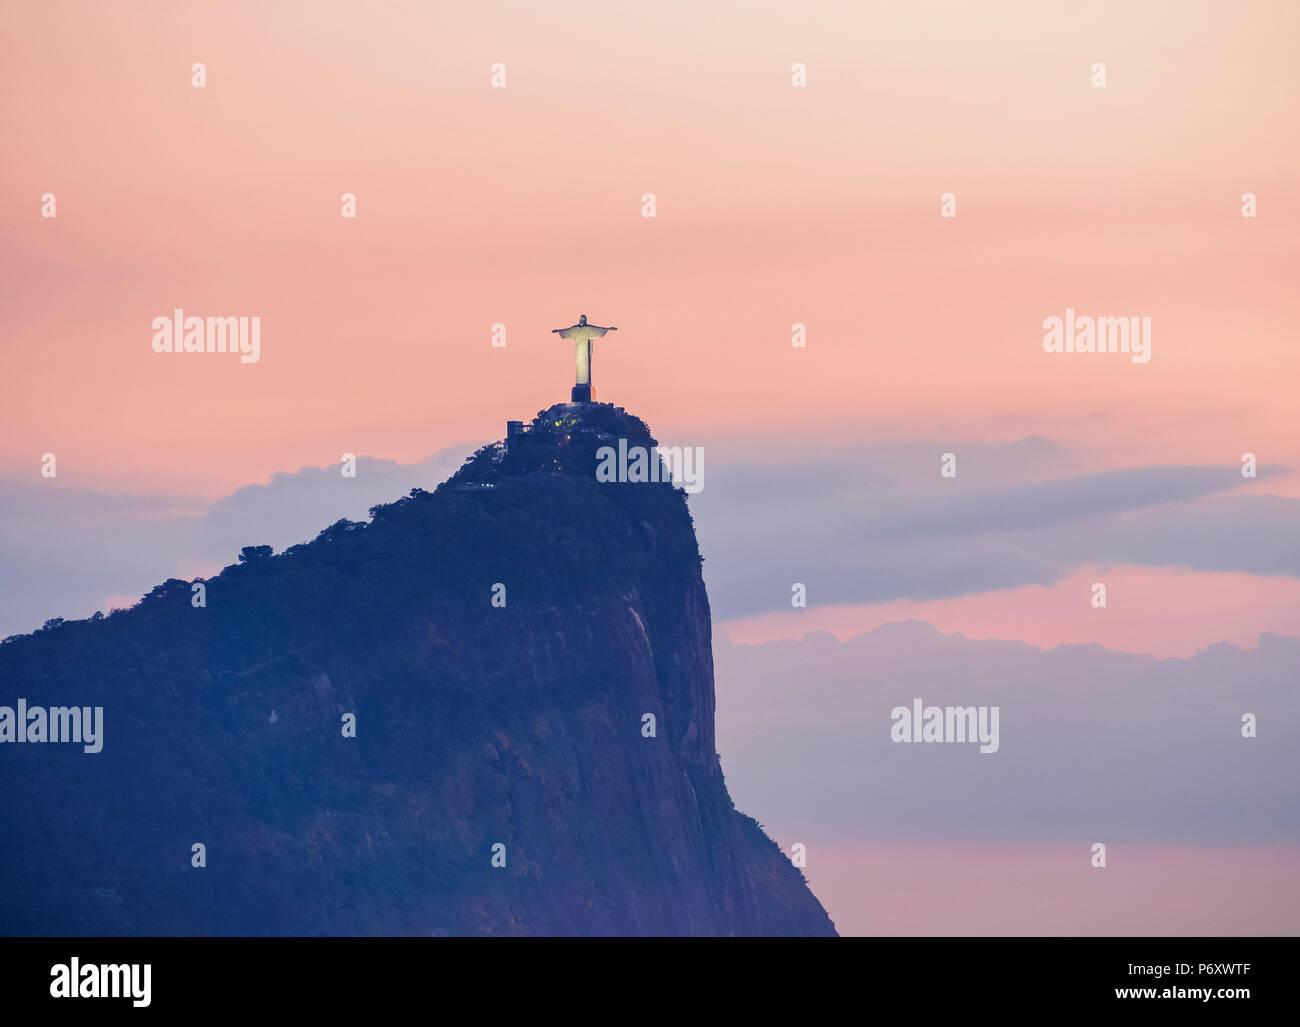 Christ the Redeemer and Corcovado Mountain at sunrise, Rio de Janeiro, Brazil Stock Photo